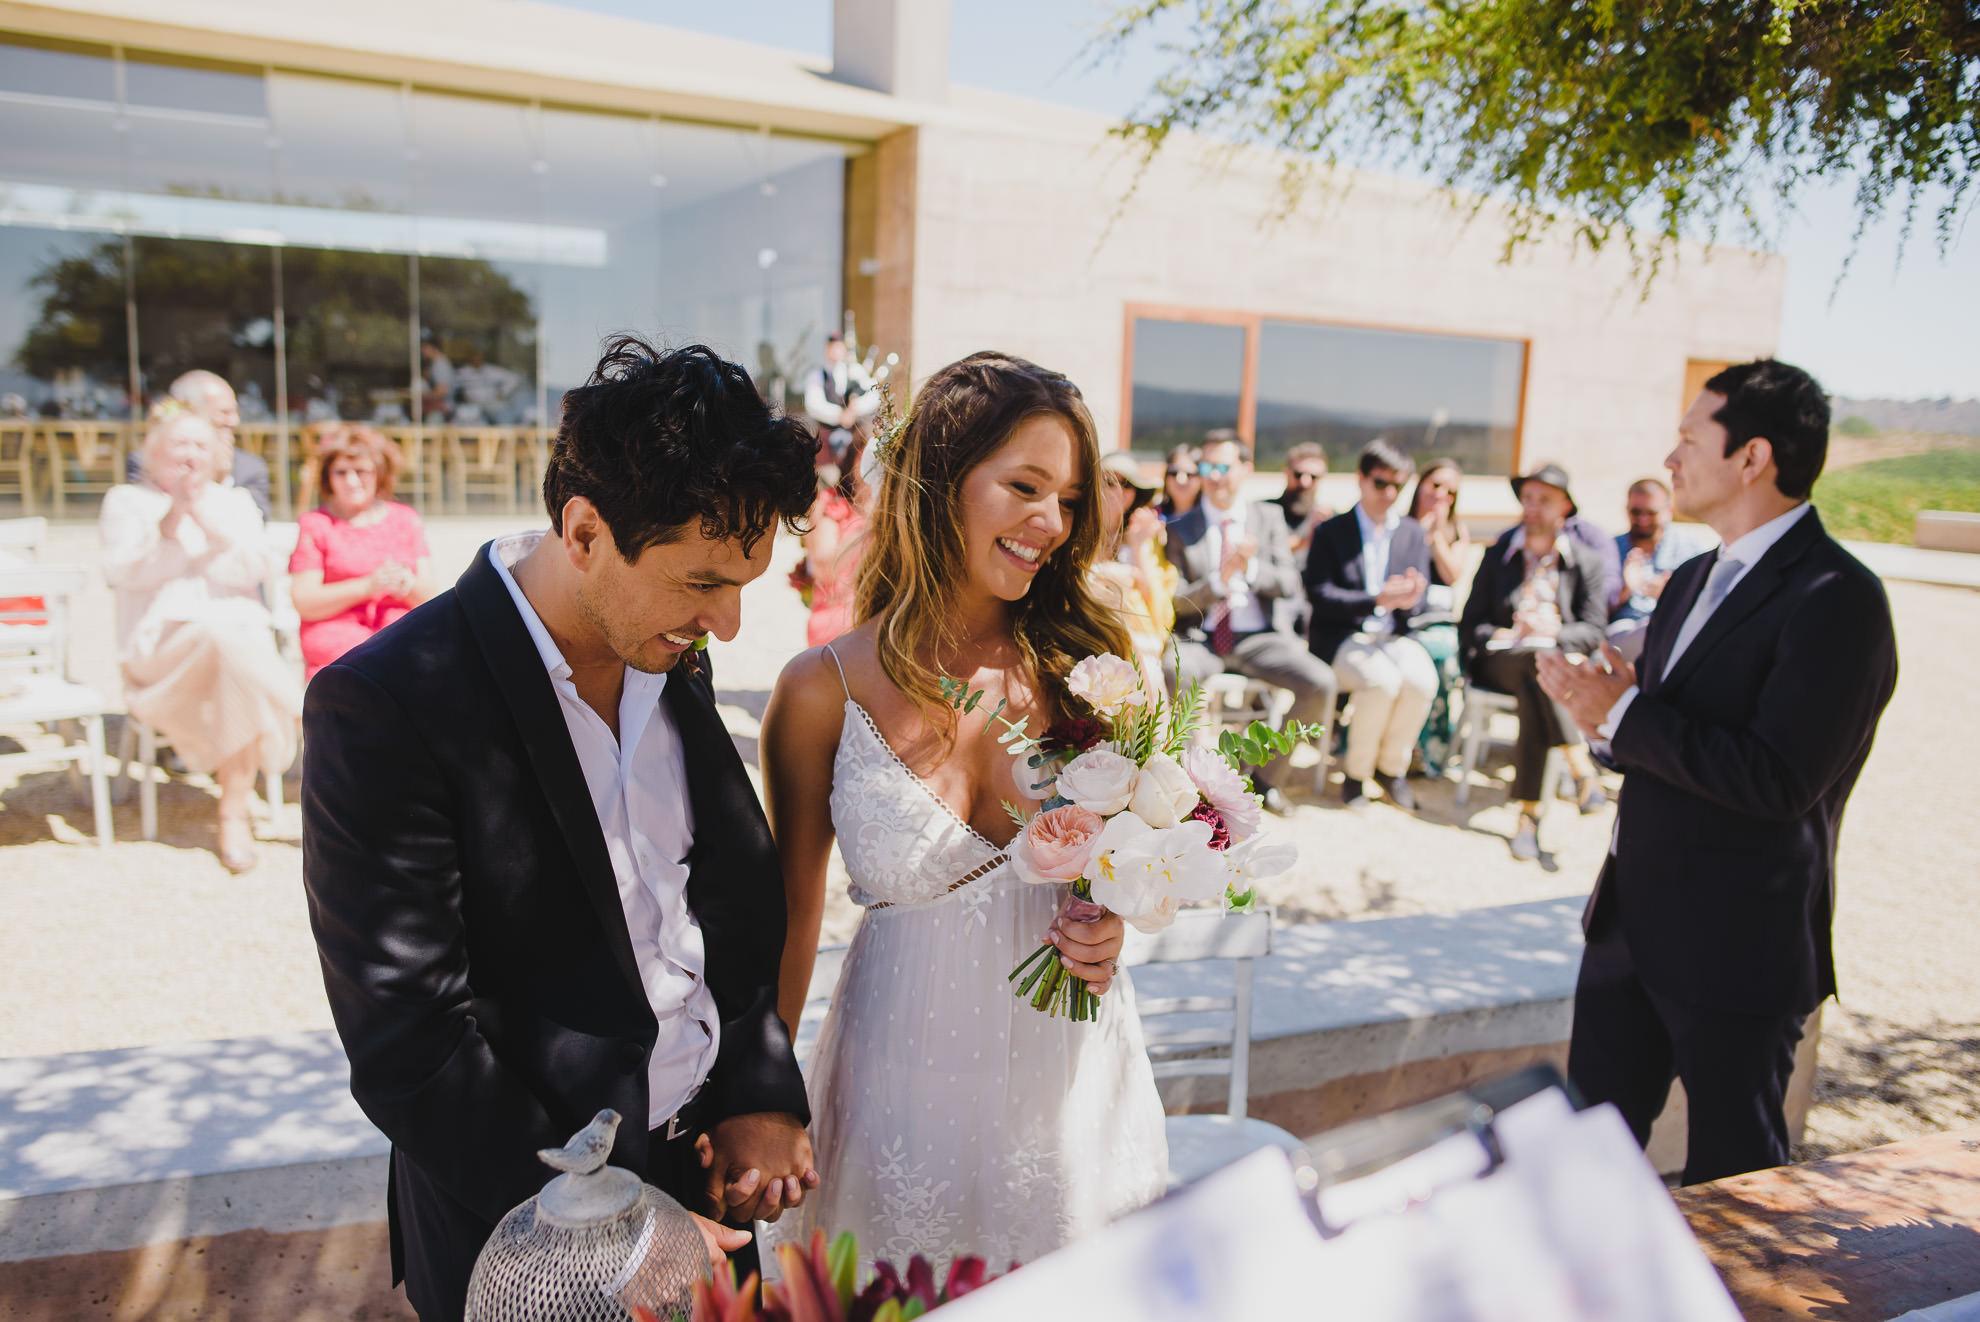 wedding casablanca valley-18.jpg